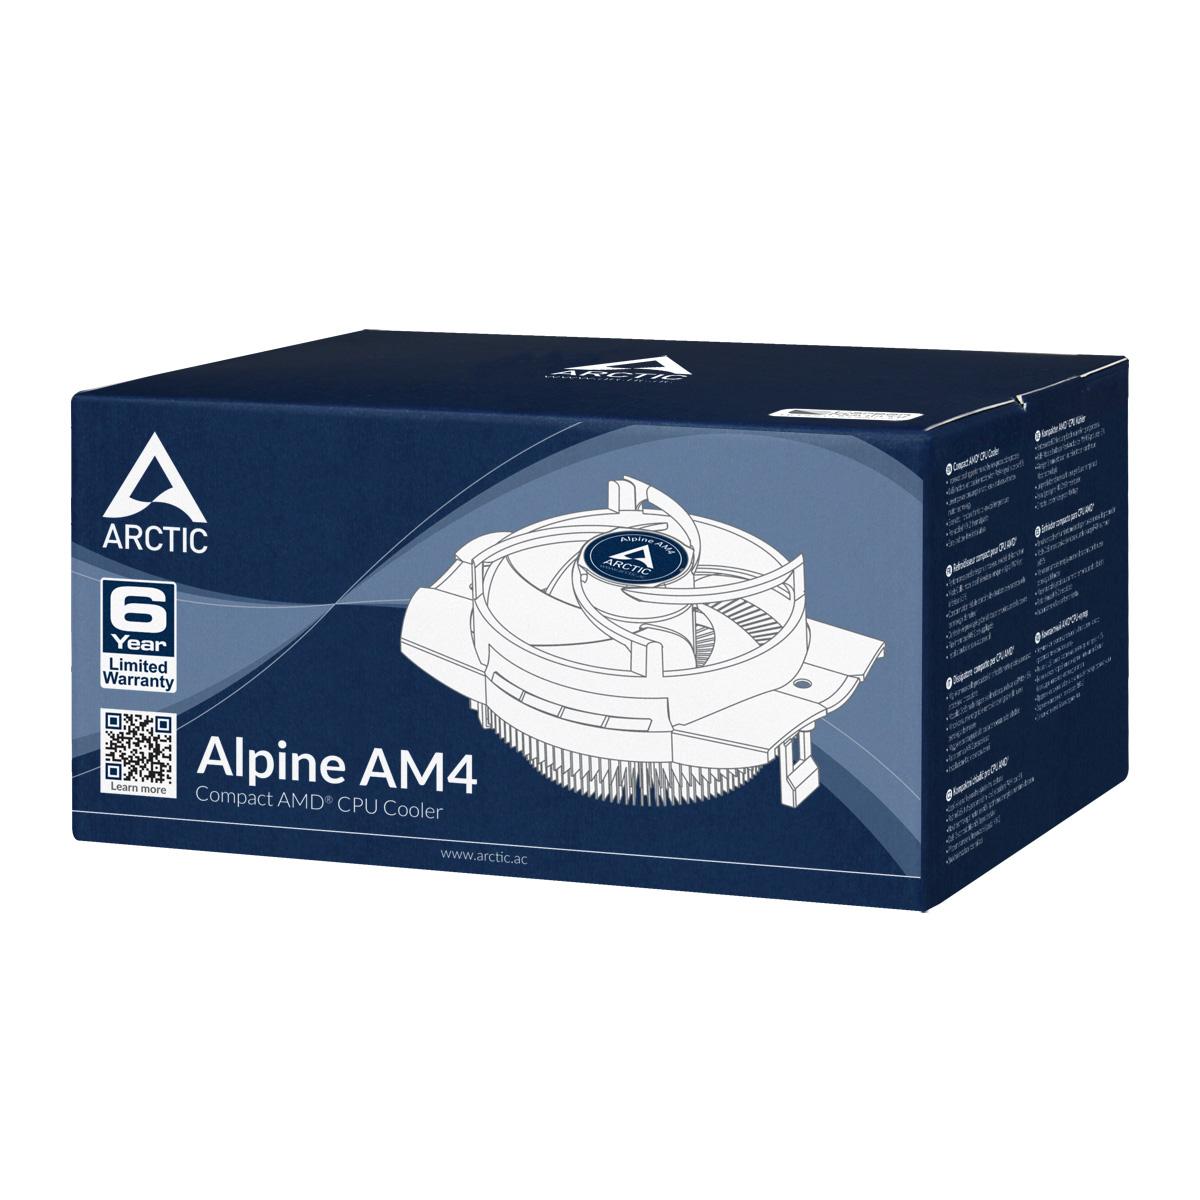 Kompakter AMD CPU-Kühler ARCTIC Alpine AM4 Produktverpackung Vorderansicht